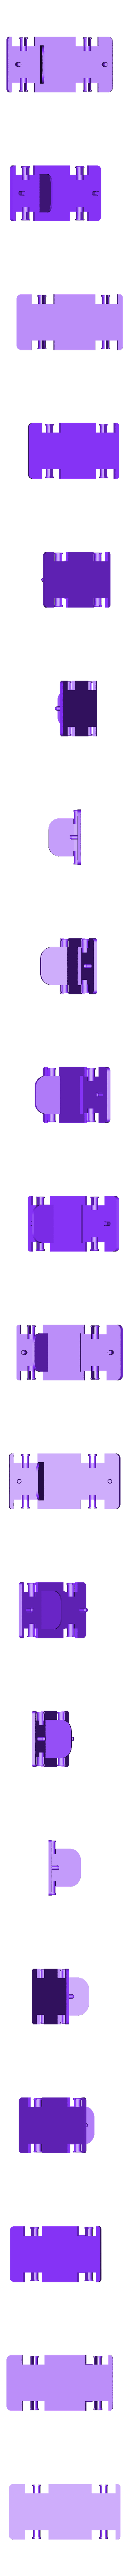 playmobil_kids_car_bottom.stl Download free STL file Playmobil kids mini car • Object to 3D print, sokinkeso